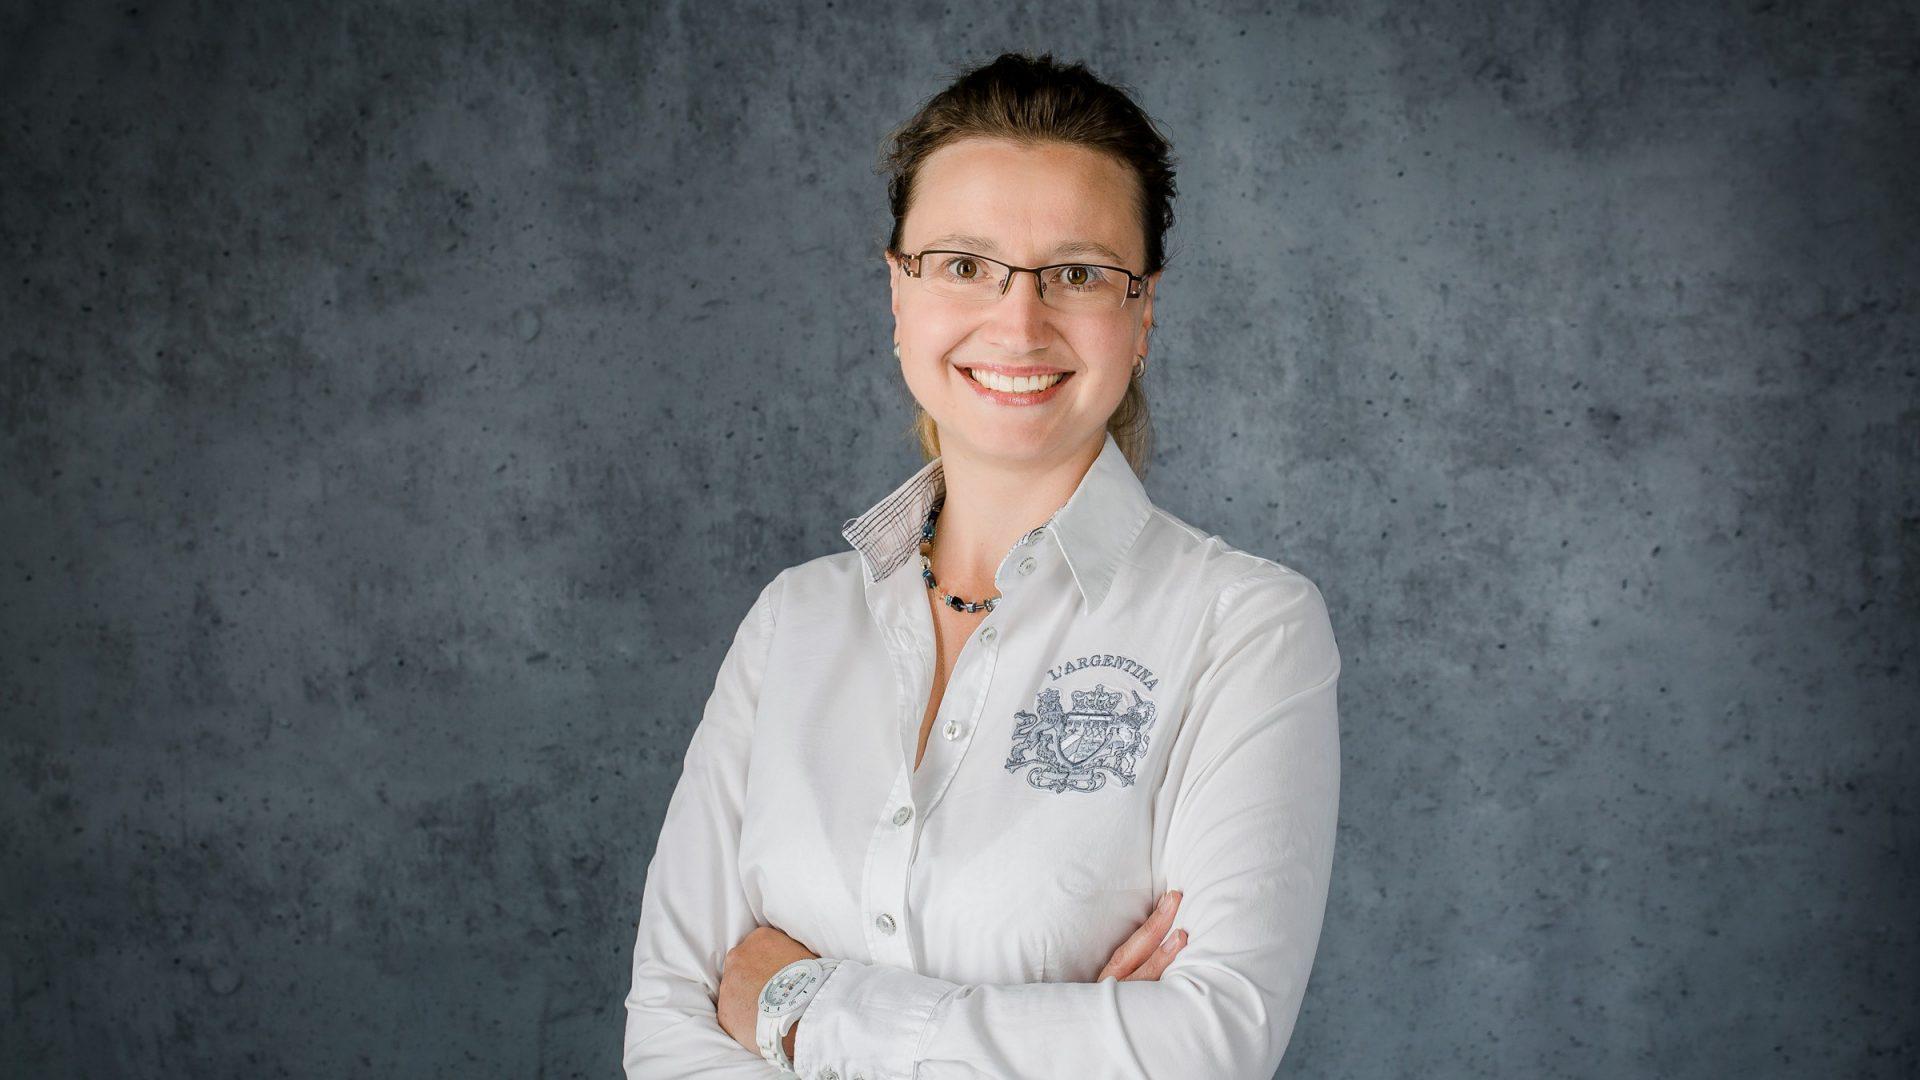 Caroline Lutz-Schmidl